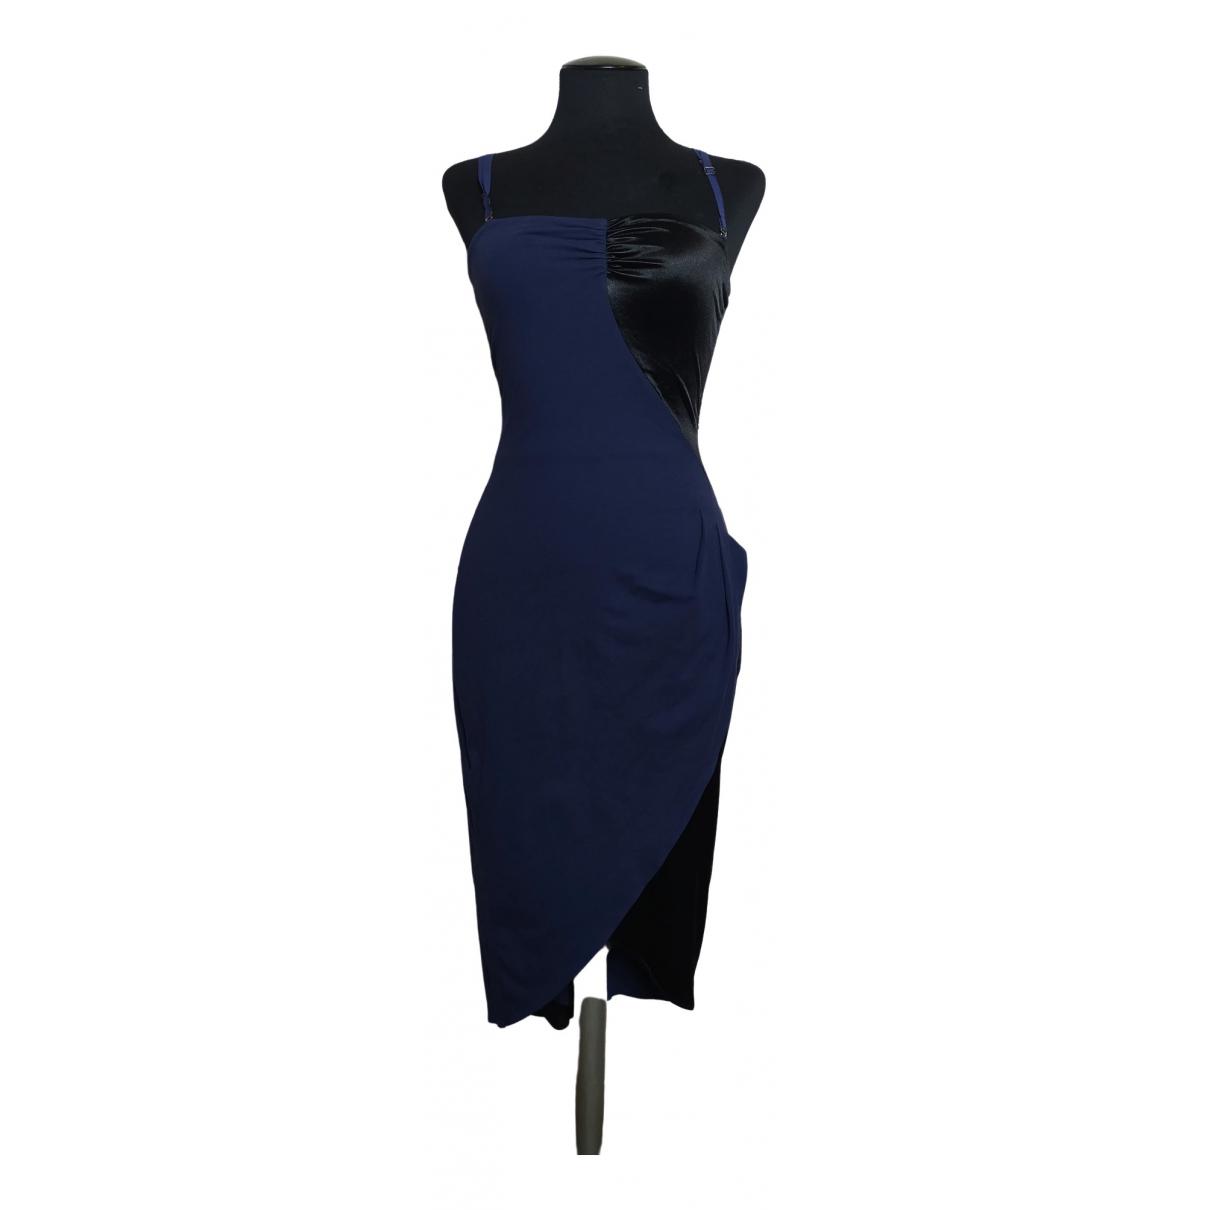 Armani Jeans \N Navy Cotton - elasthane dress for Women S International